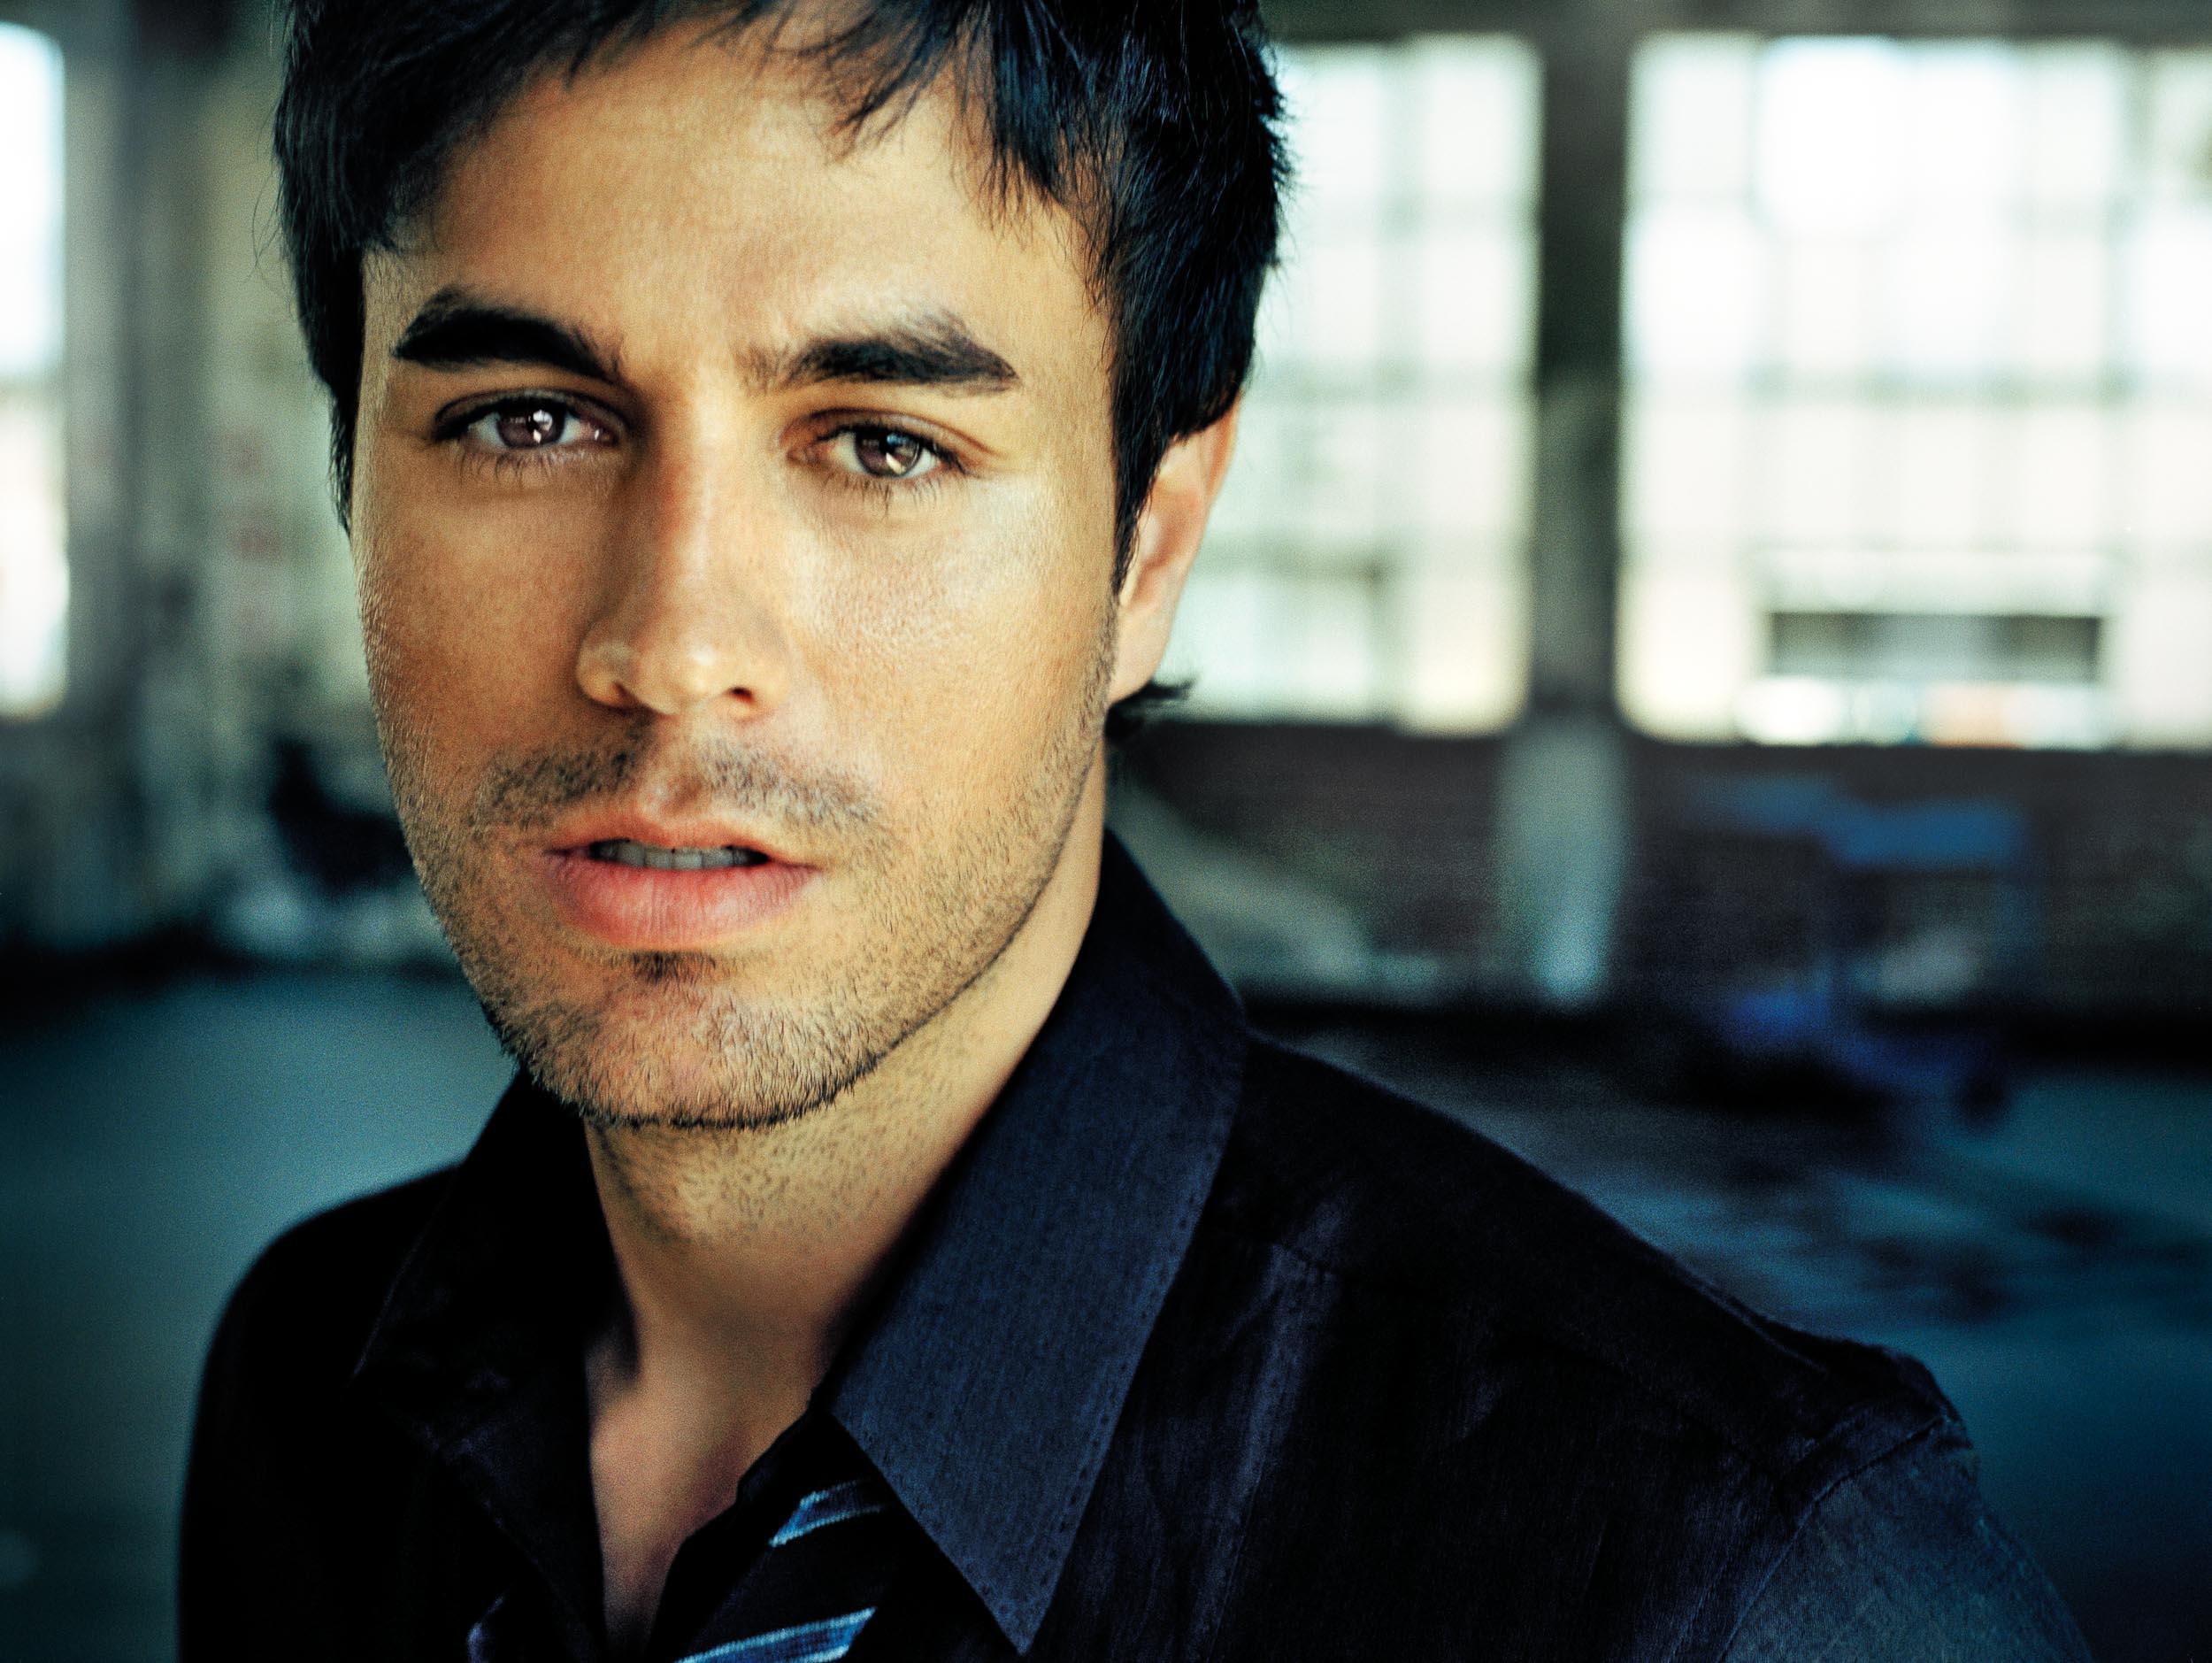 Enrique_Iglesias-Chapman_Baehler07.jpg